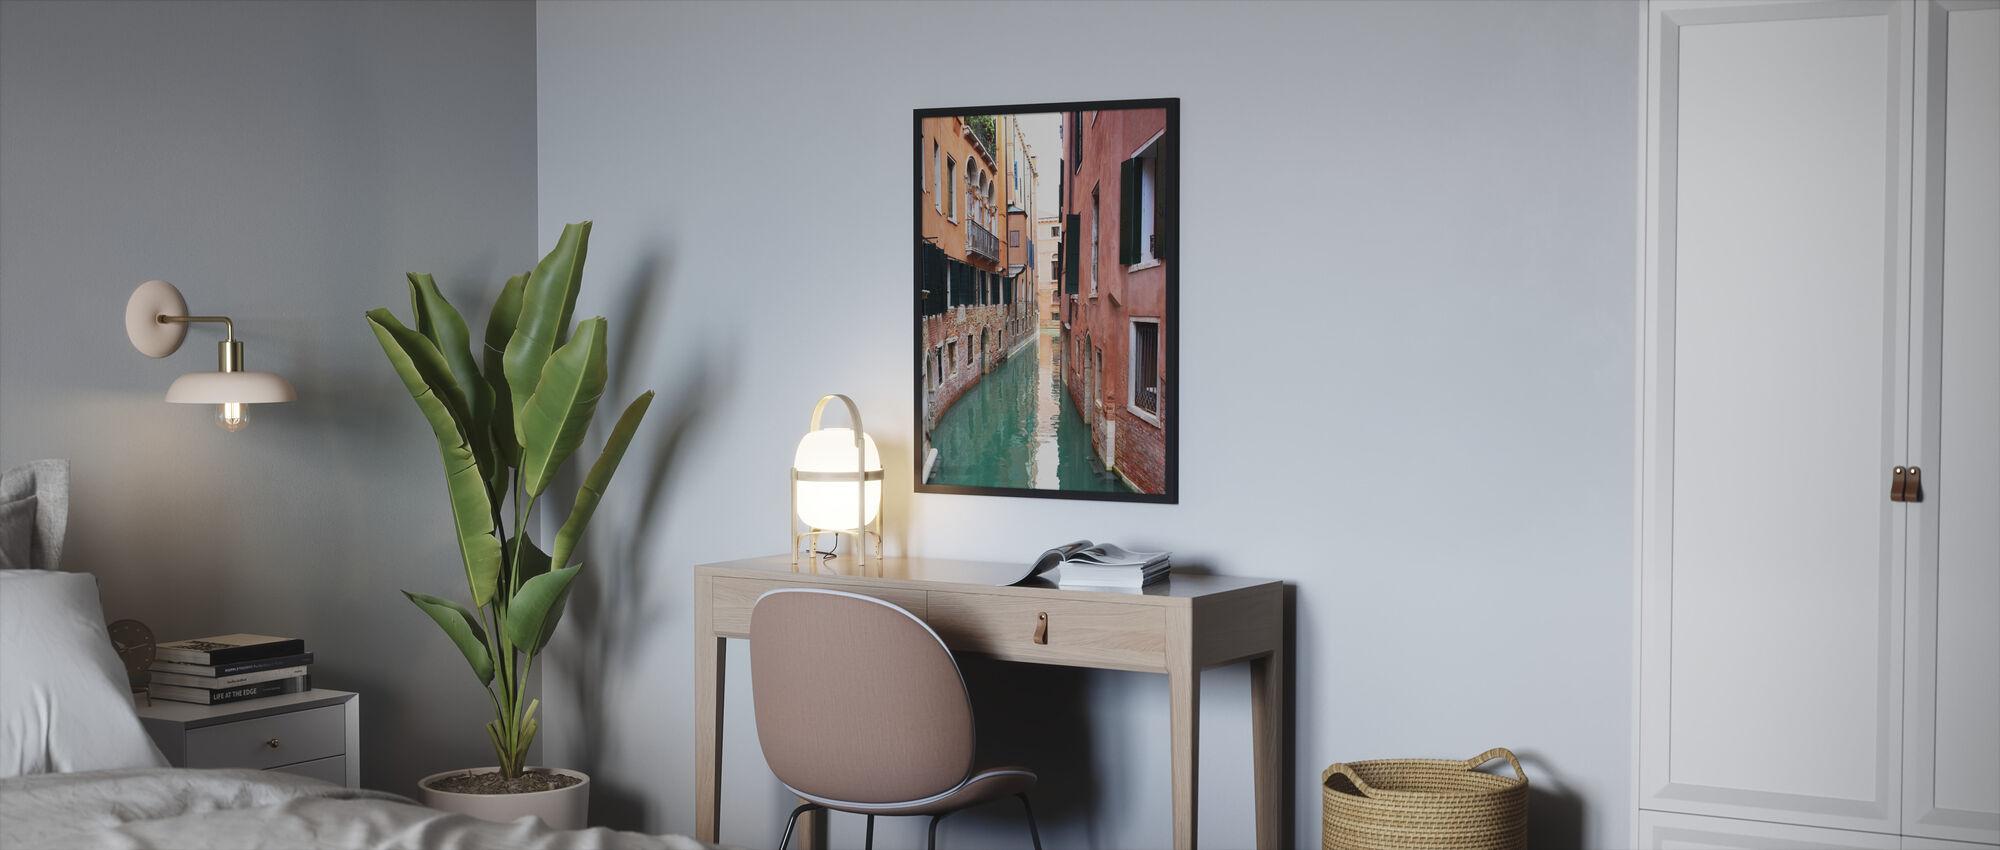 Tranquility in Venice - Framed print - Bedroom